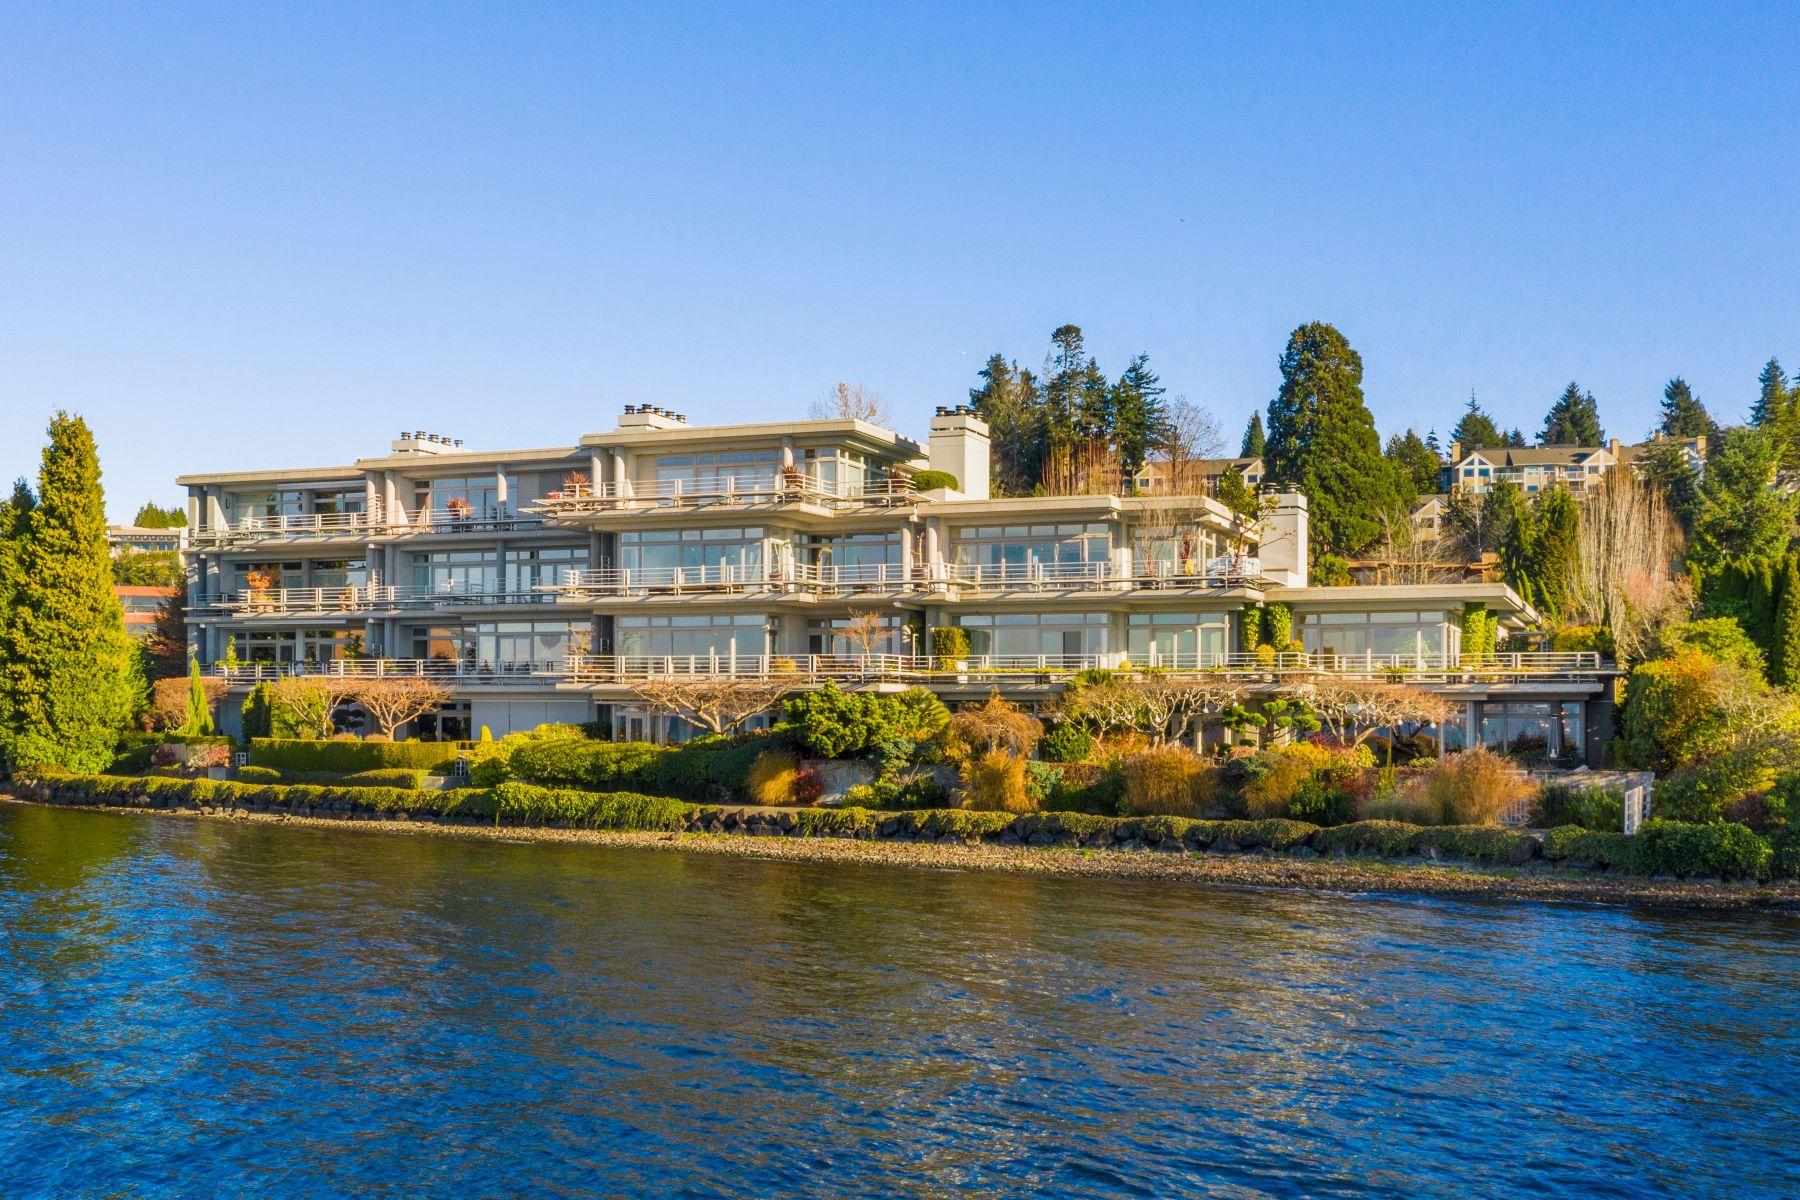 Condominiums for Sale at 5505 Lake Washington Blvd NE #1D, Kirkland, WA 98033 5505 Lake Washington Blvd NE #1D Kirkland, Washington 98033 United States